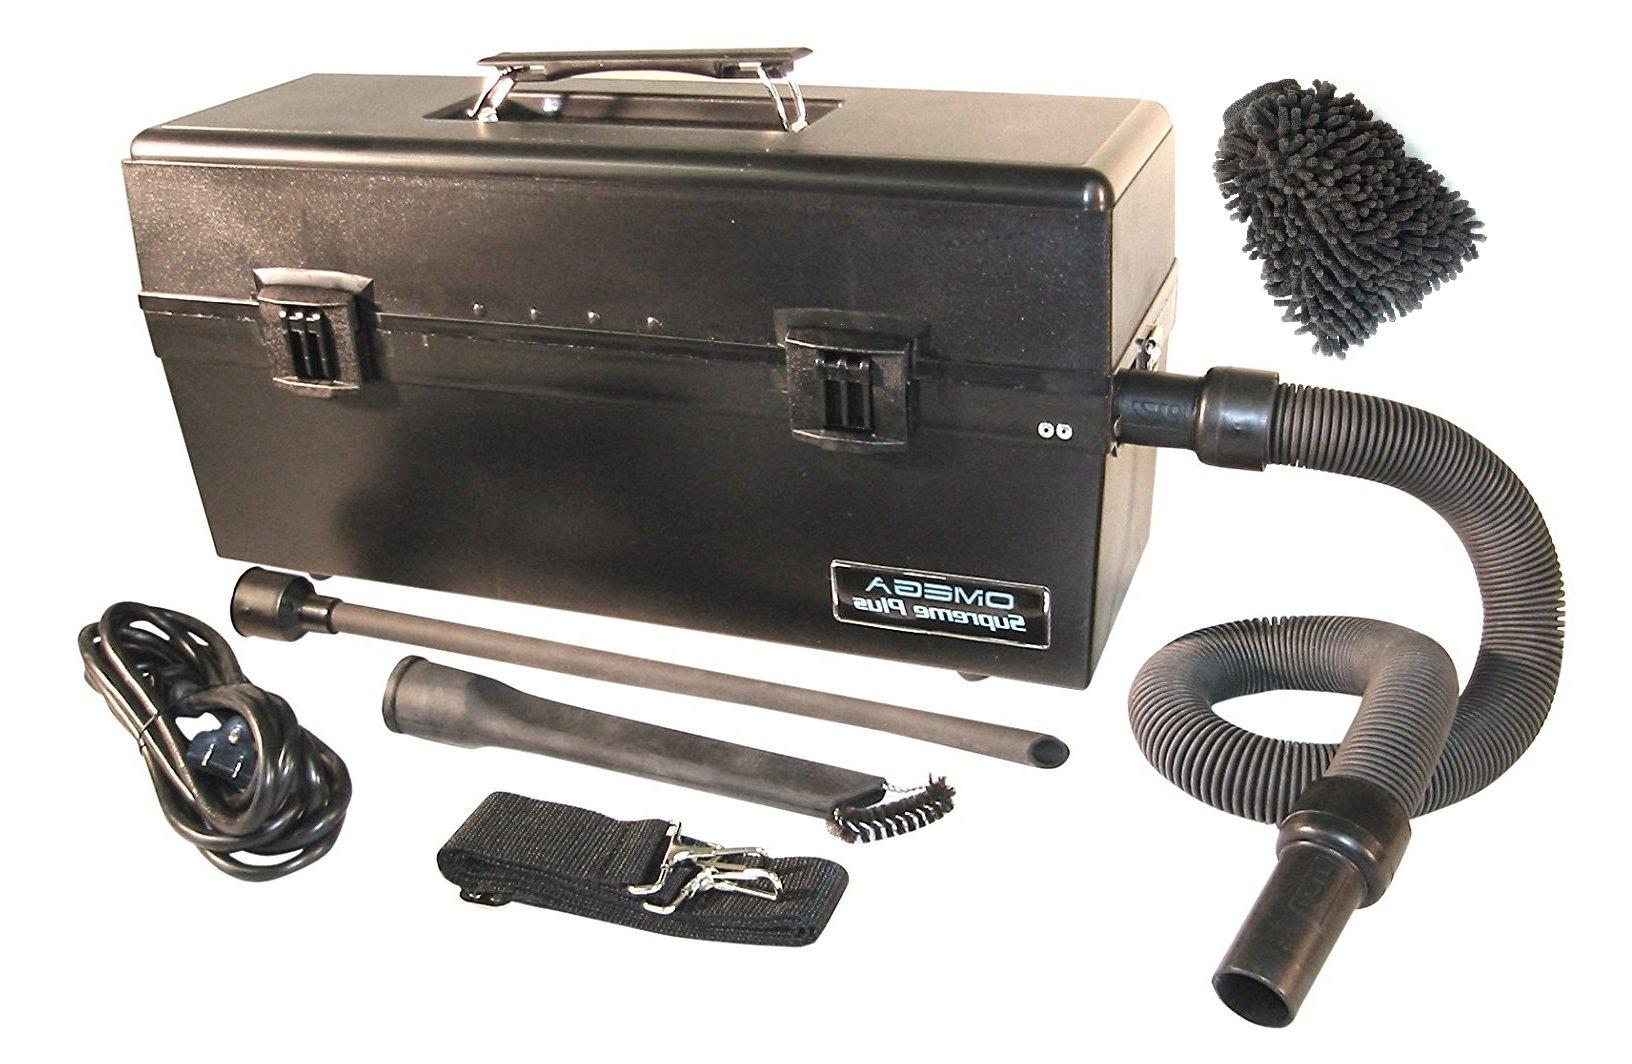 VACOMEGASLFH Atrix Omega Supreme HEPA Vacuum, 120 Volt, Clean Room Fine Particle VAC (Complete Set) w/ Bonus: Premium Microfiber Cleaner Bundle by Atrix